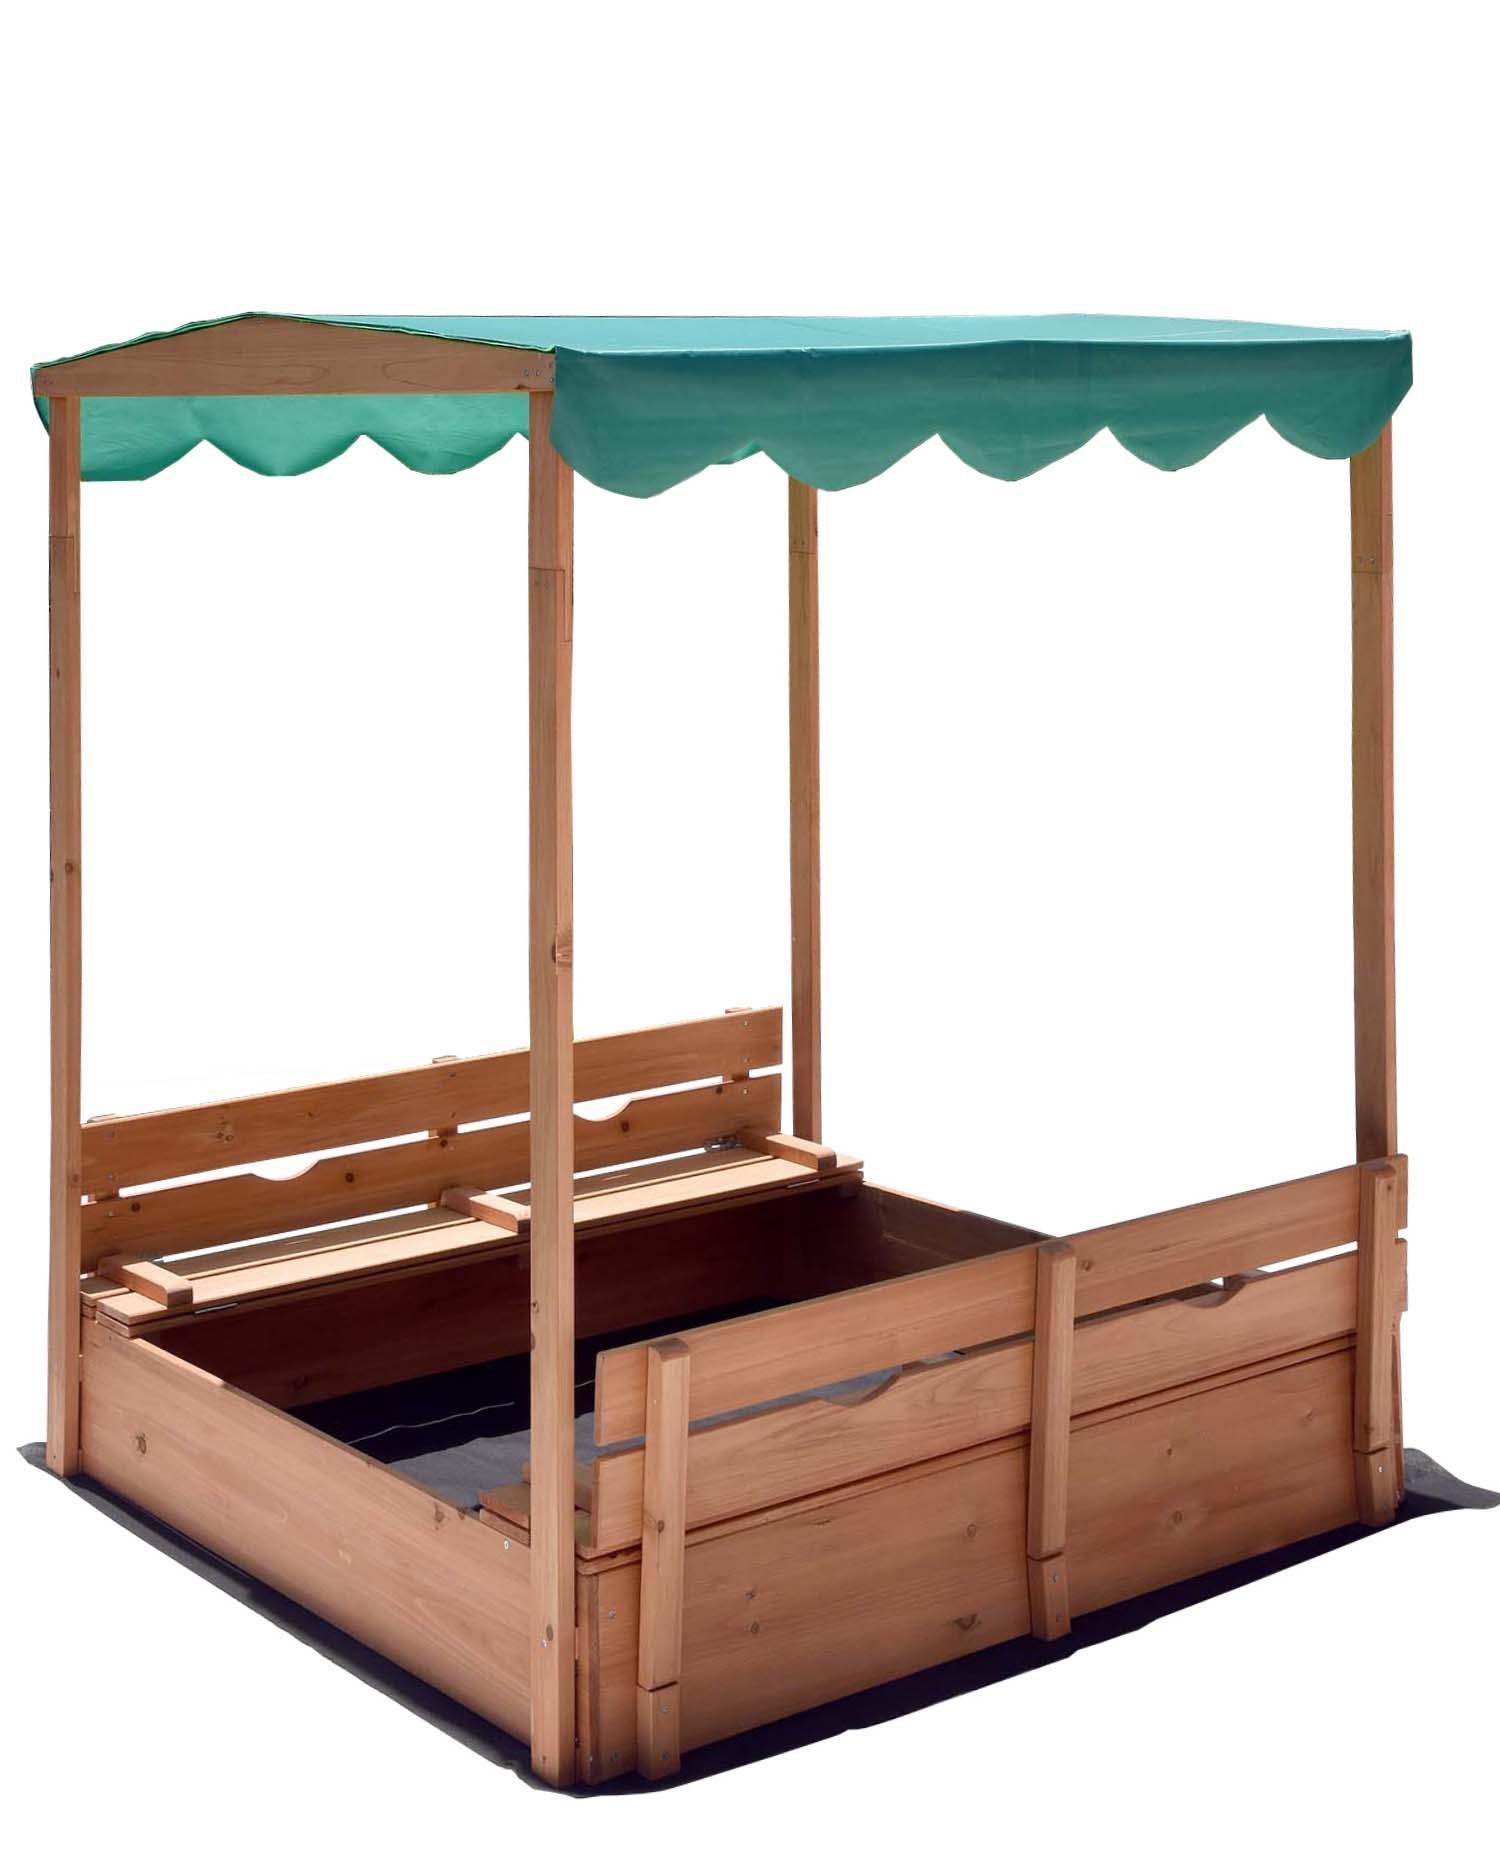 Naomi Home Kids Canopy Cedar Sandbox with Benches by Naomi Home